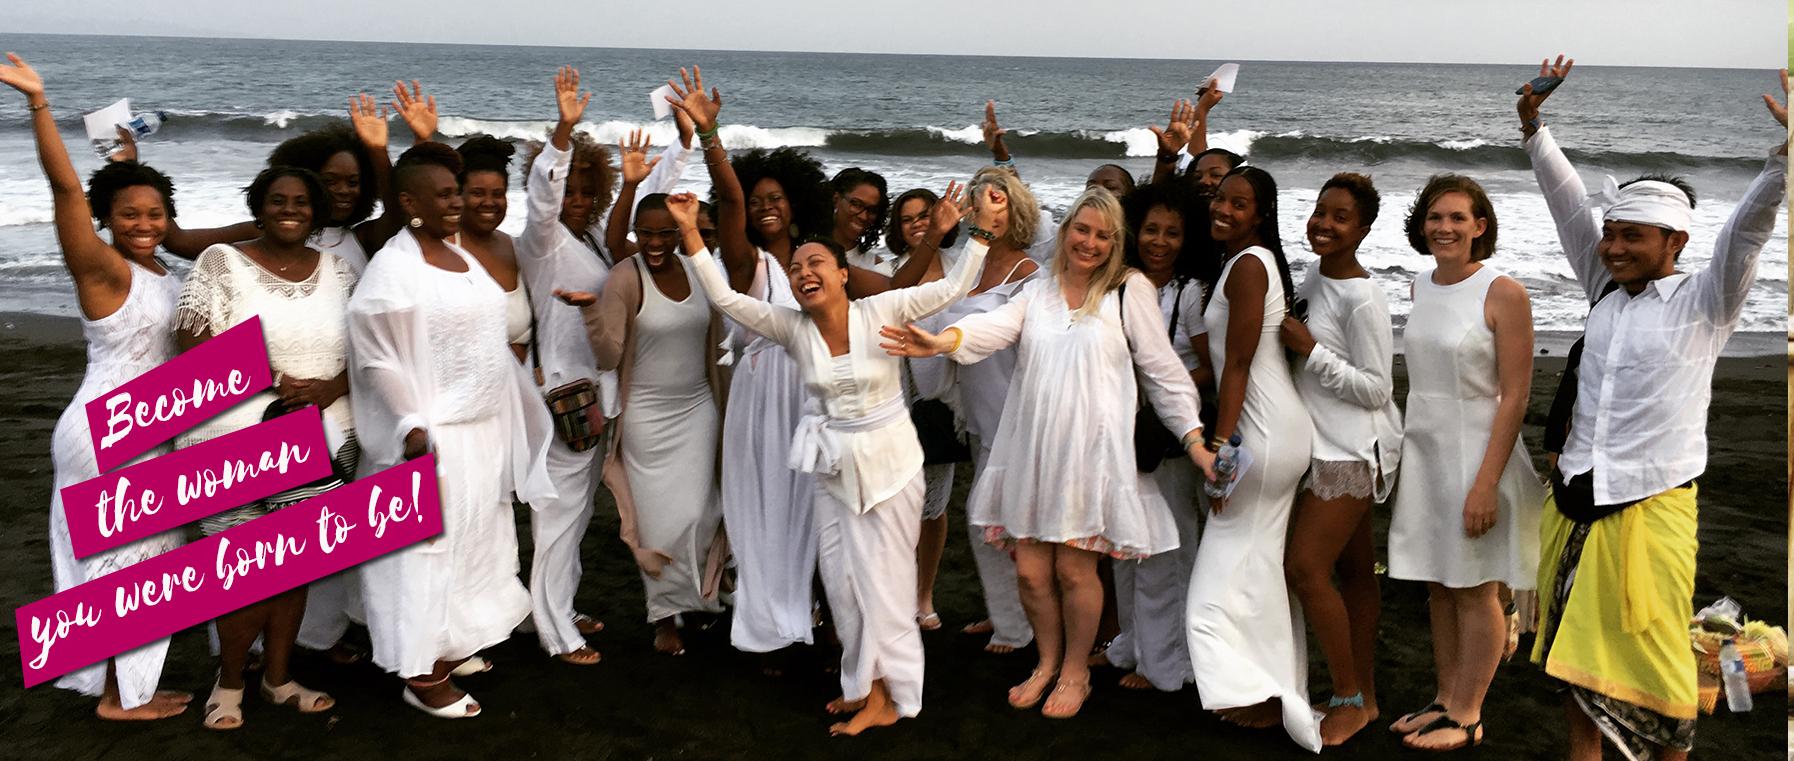 yoga healing retreat summer solstice -- bali abundance goddess pray love